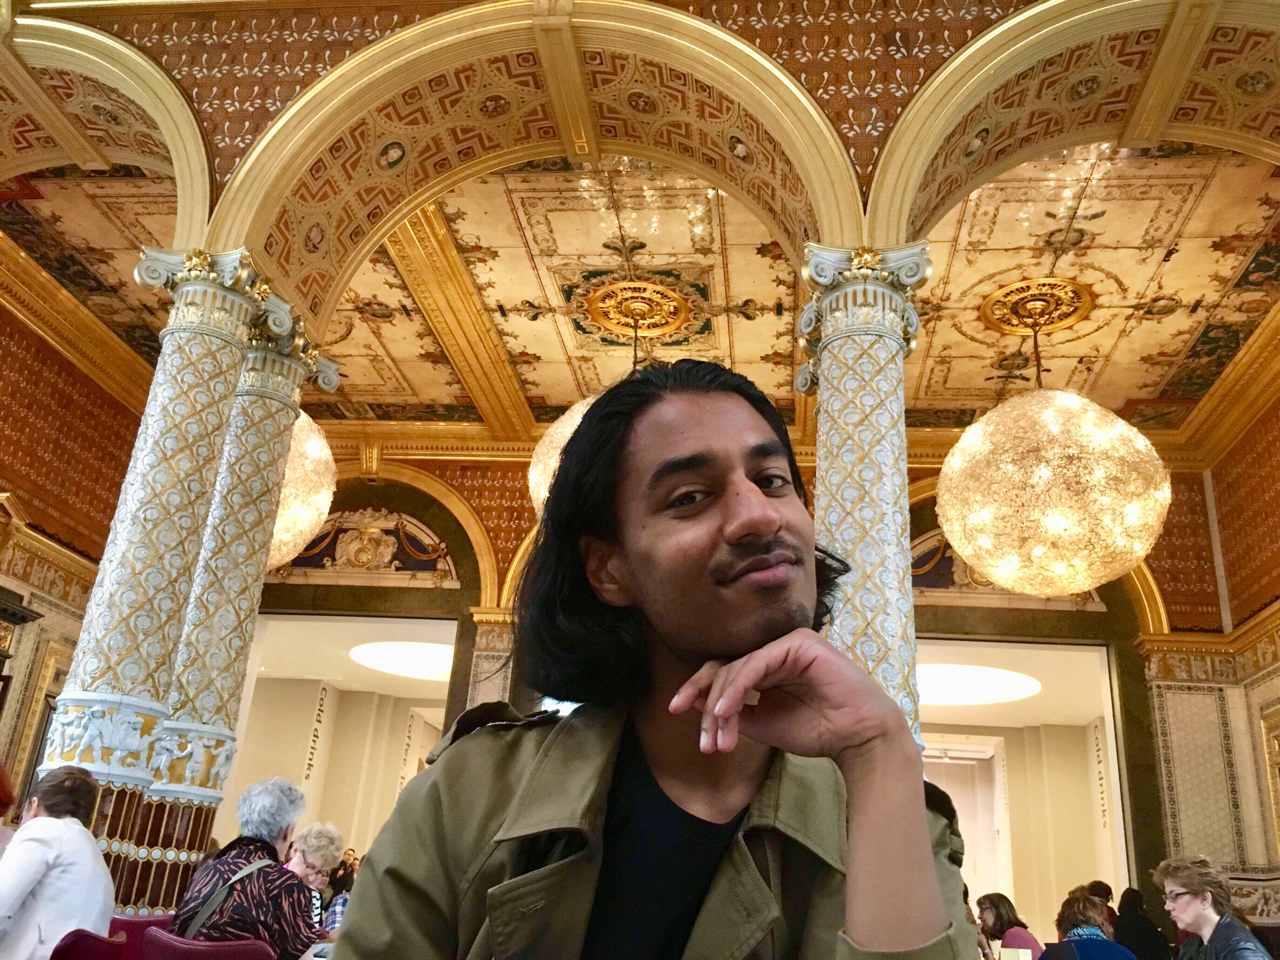 Meet field school blogger Shonel Kumar; here enjoying lunch at the Victoria and Albert Museum